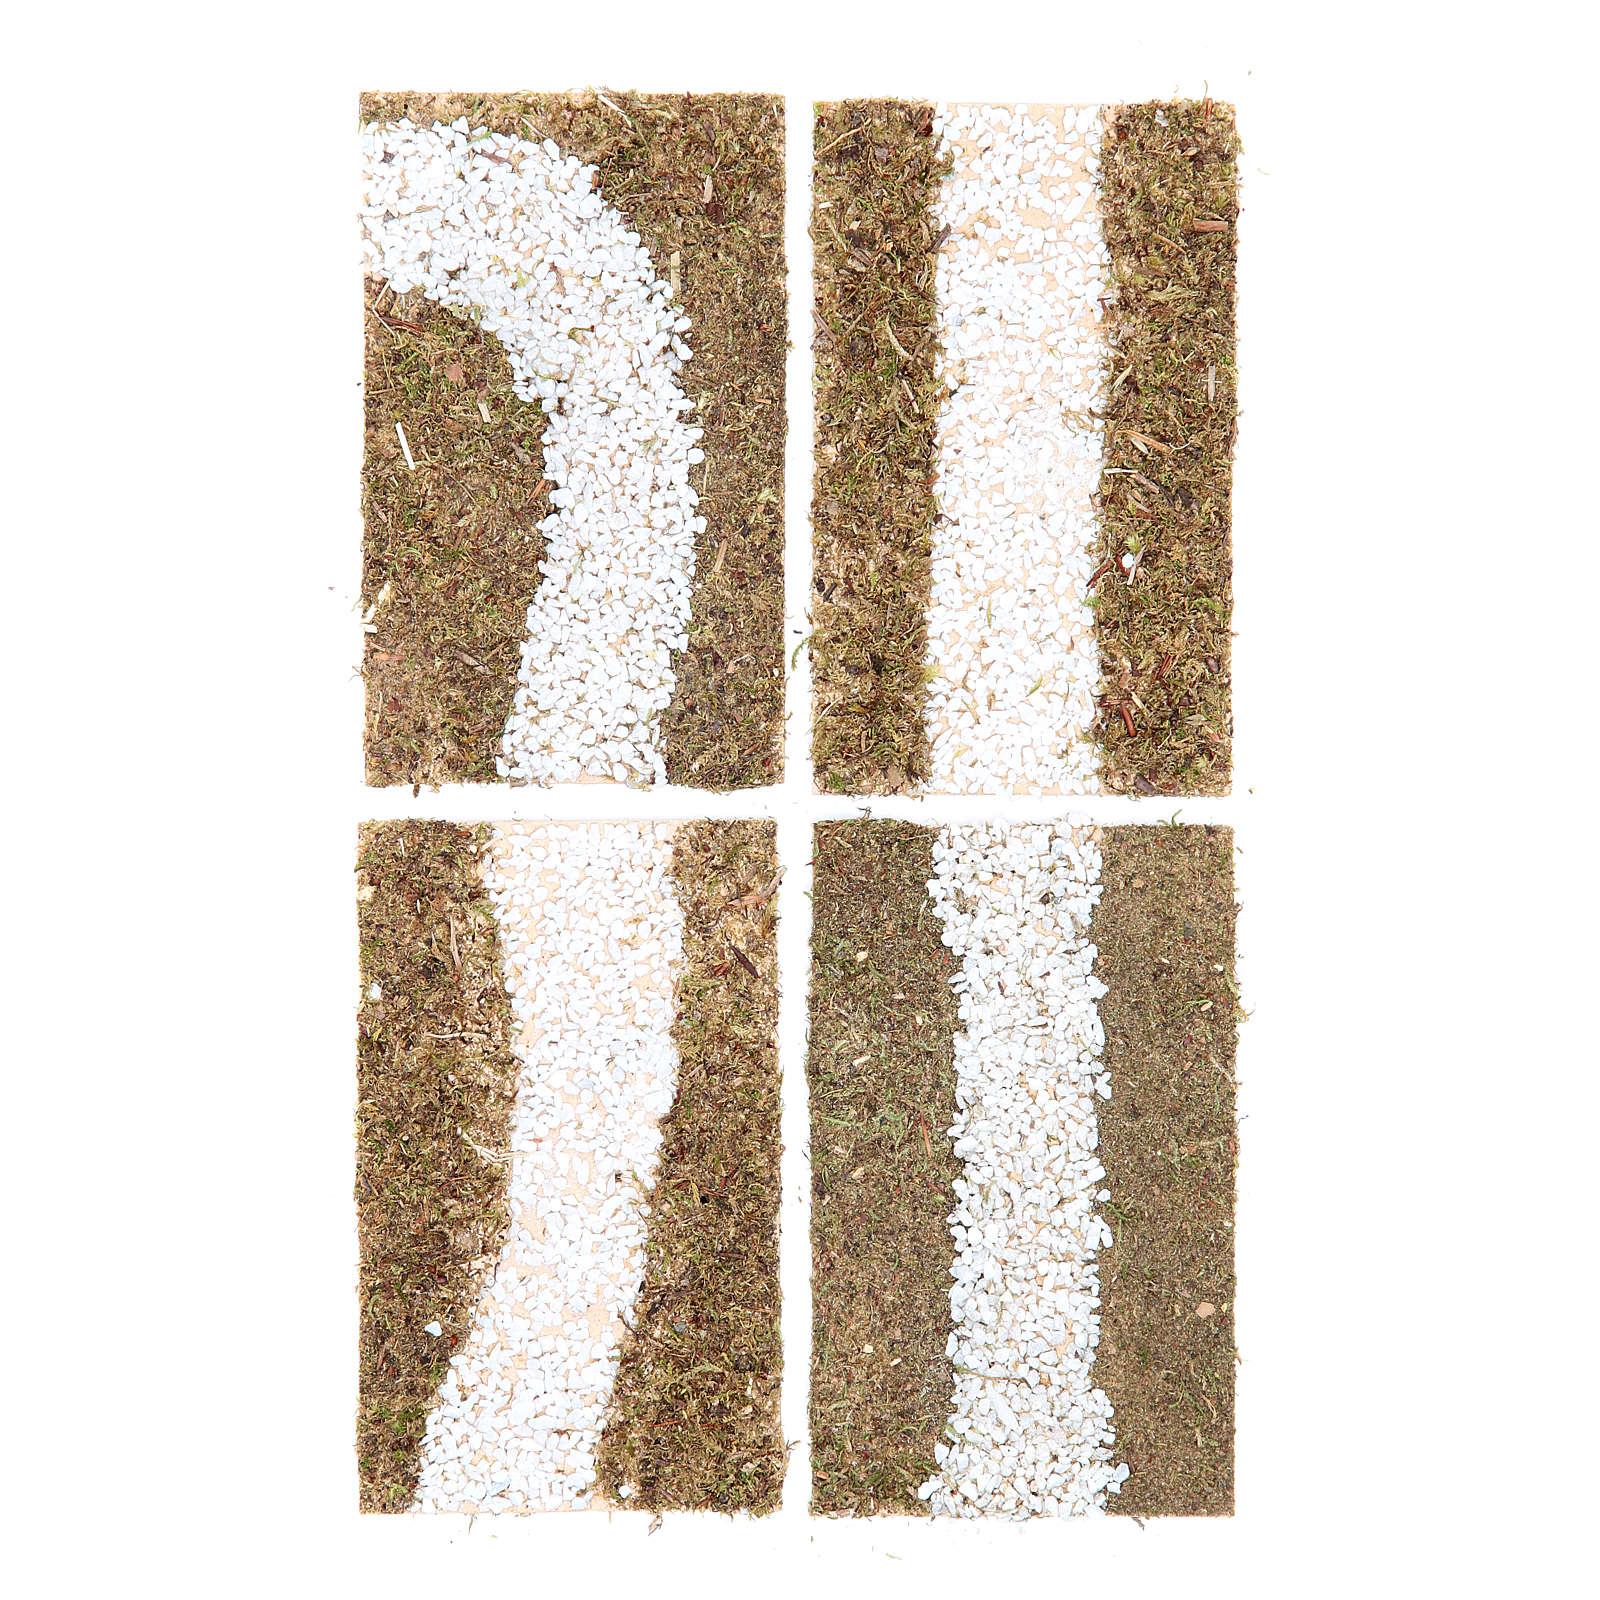 Stradina componibile presepe 4 pezzi 16x19 4